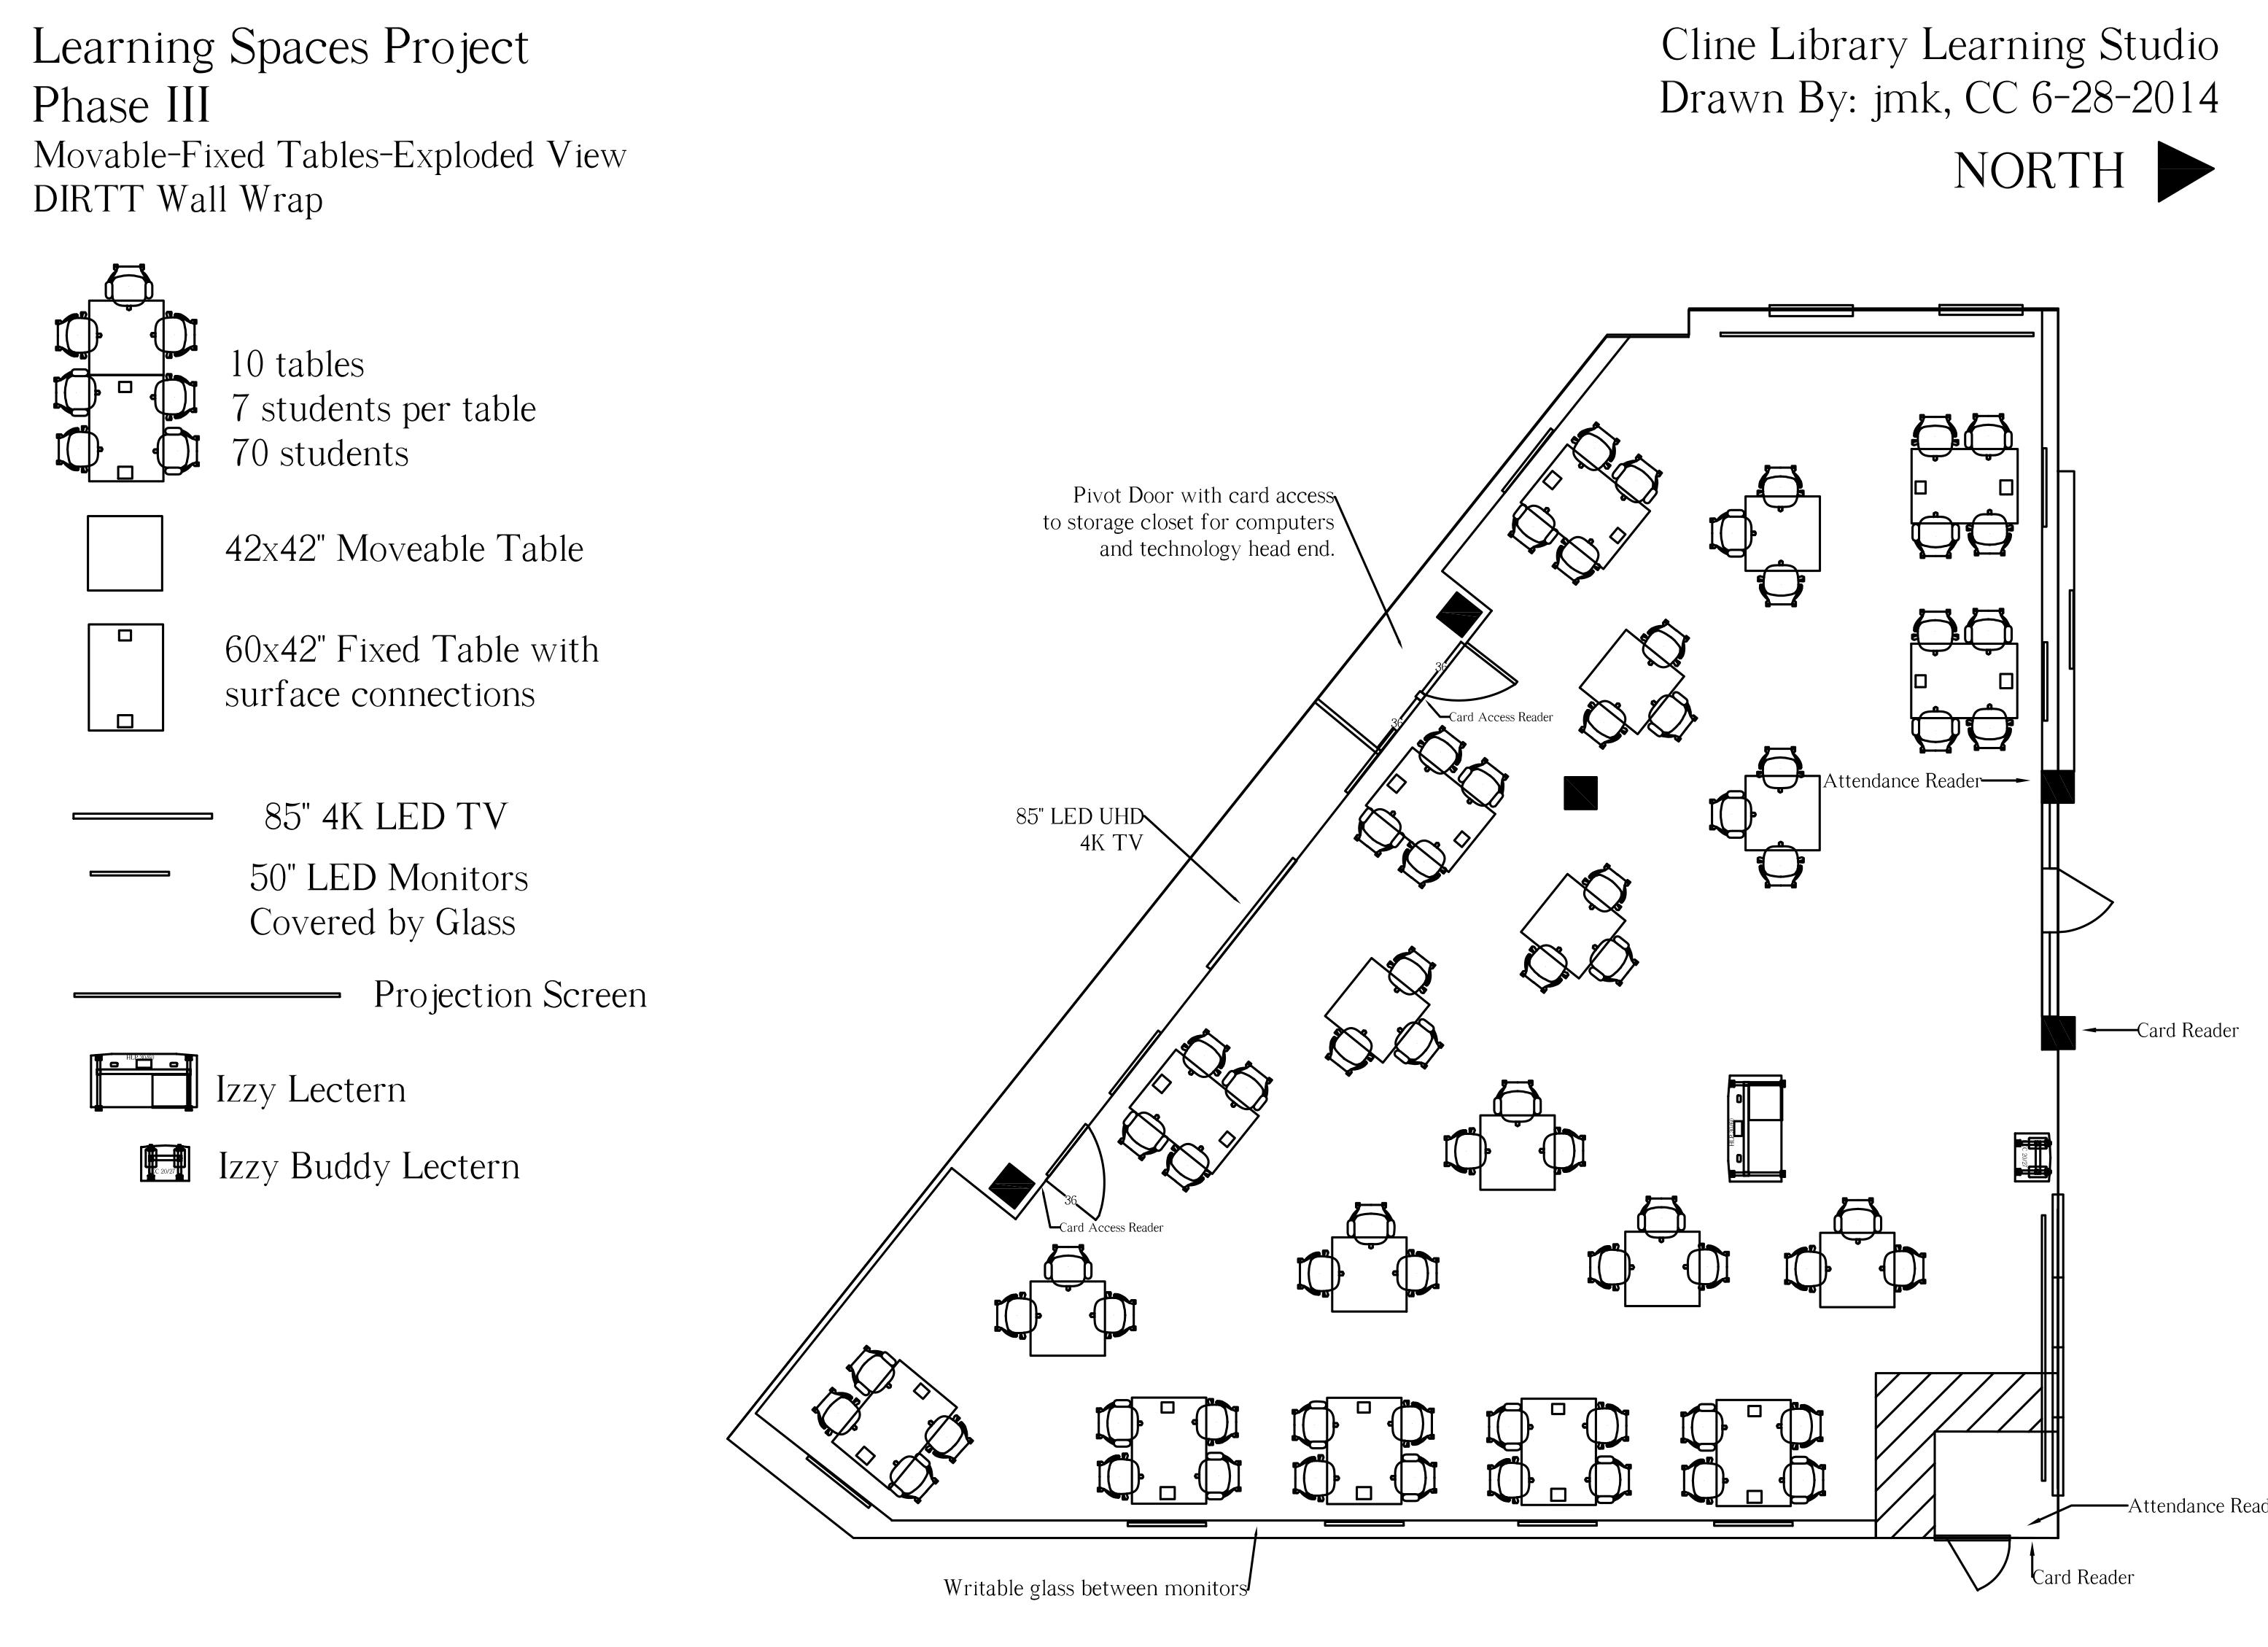 floor plans monochrome diagram of proposed floor plans